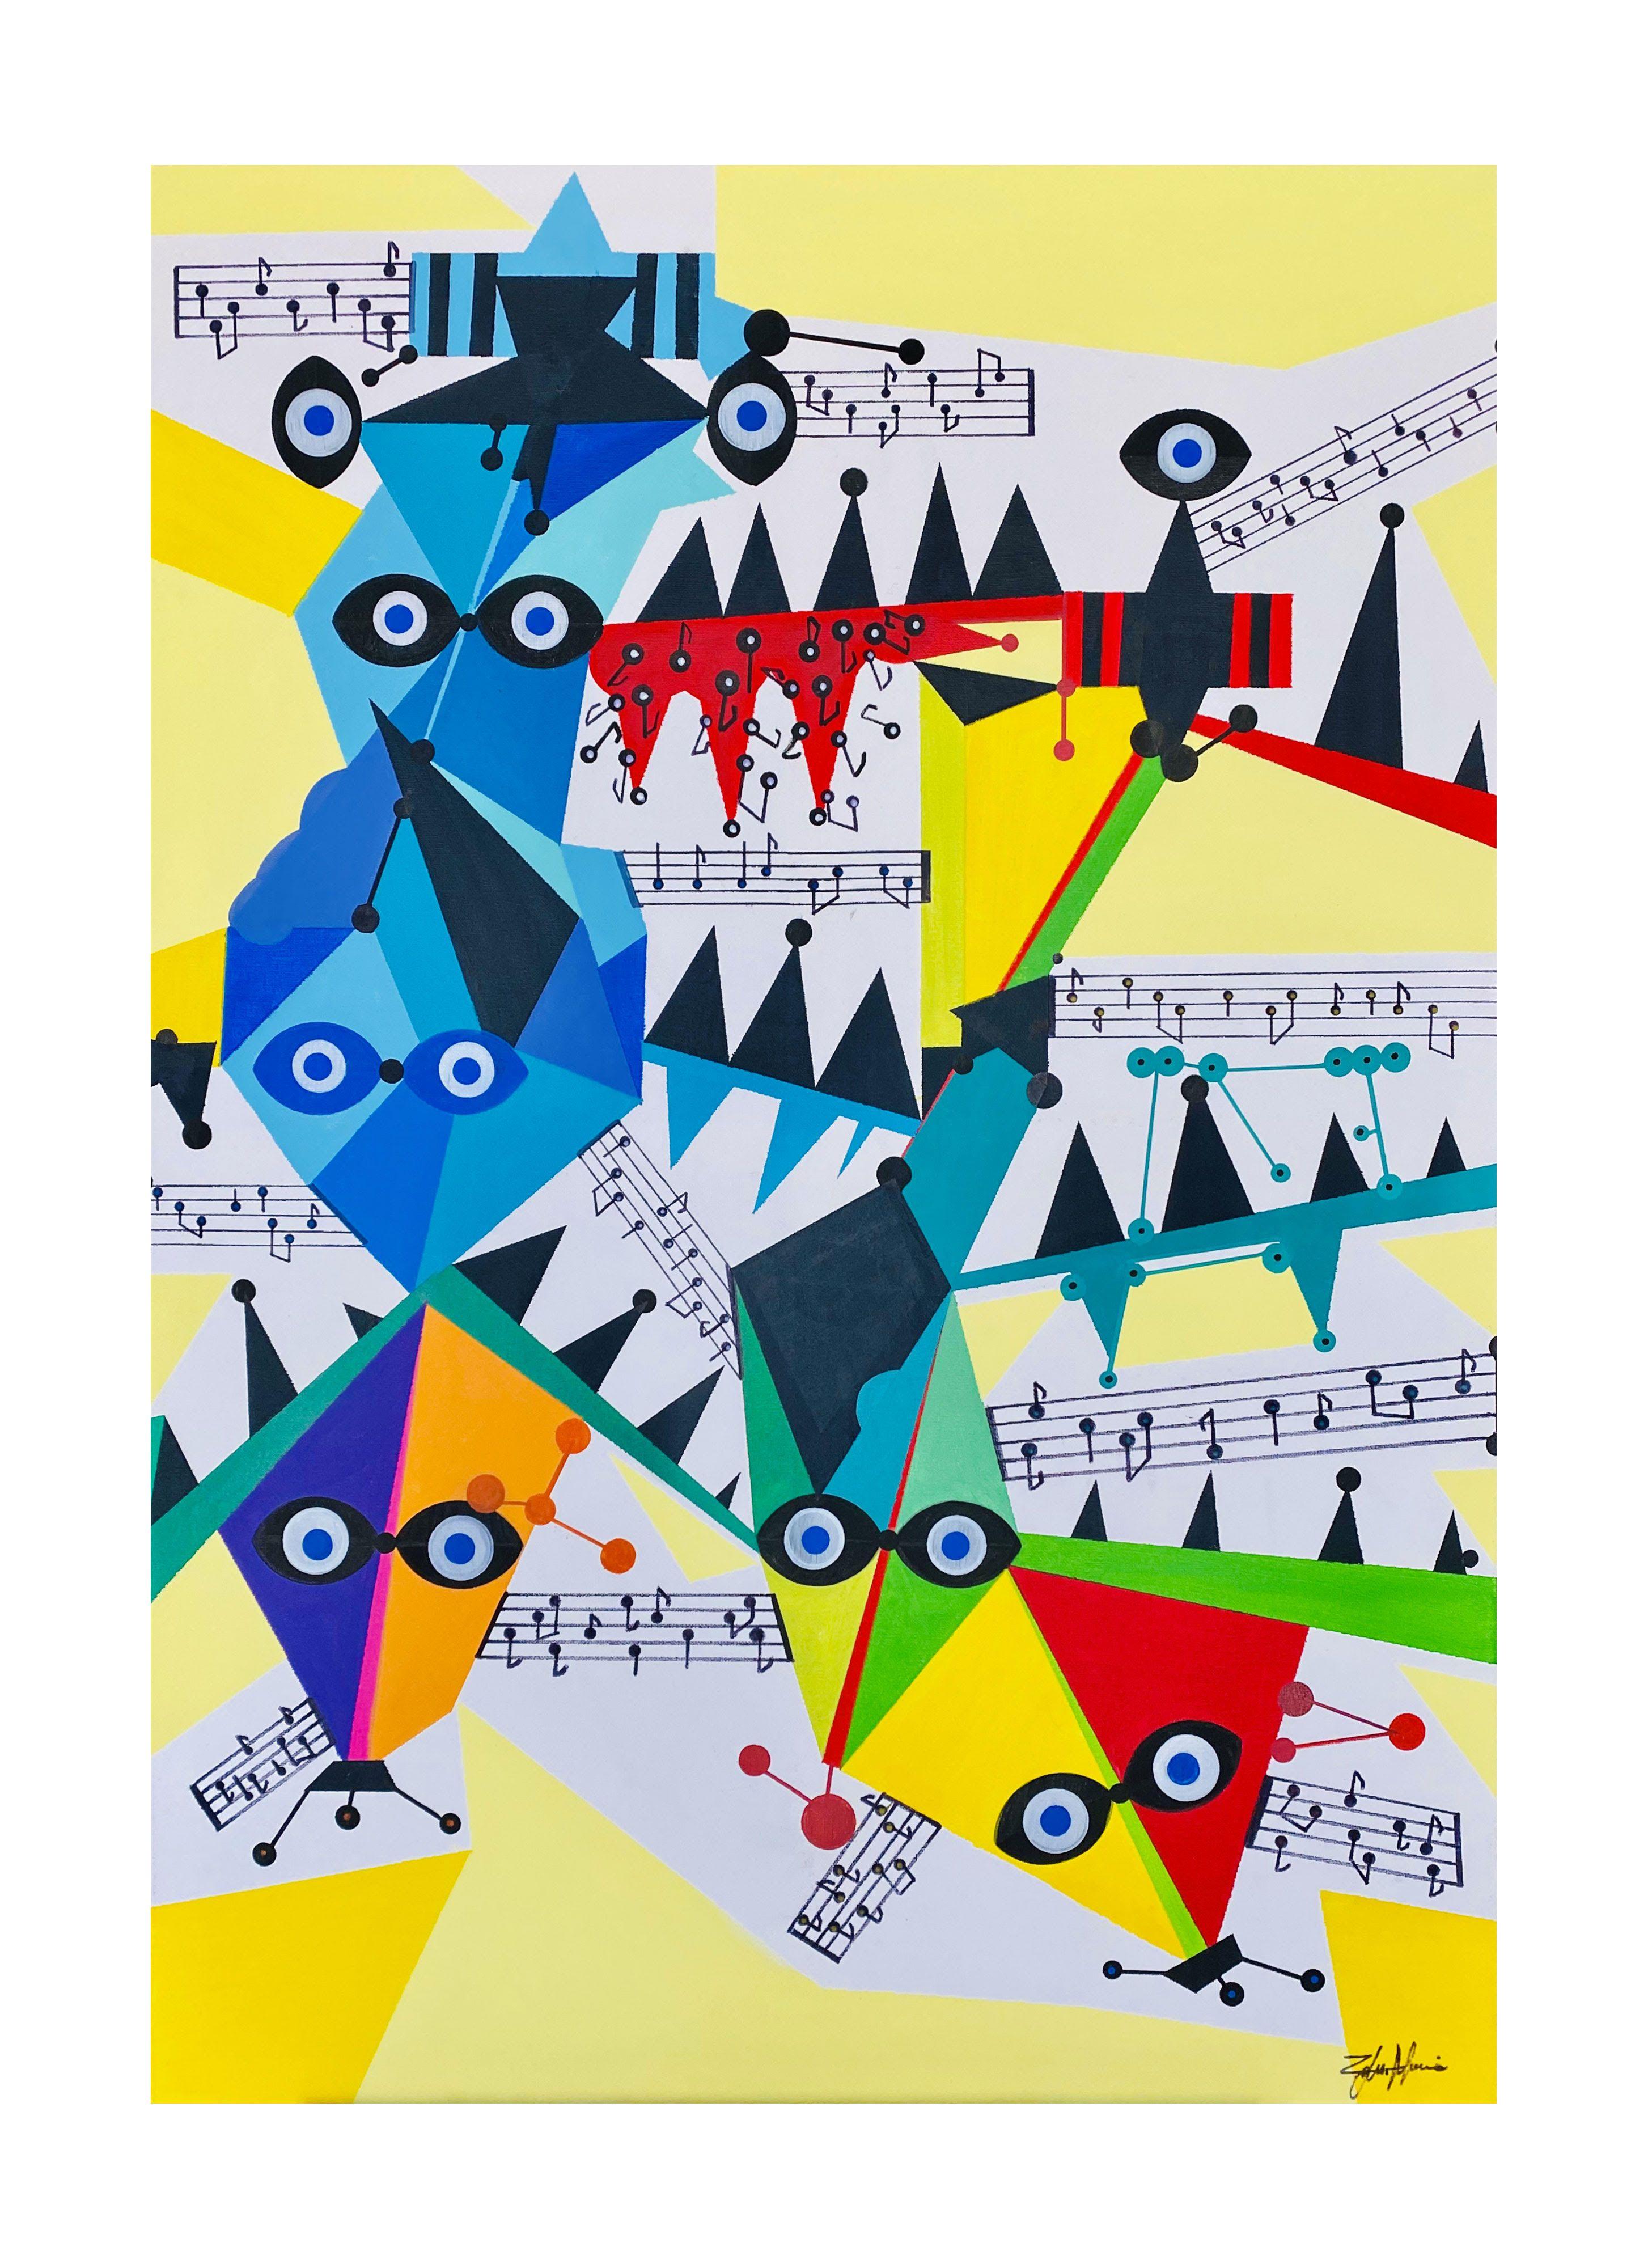 Disco Music by Massimo Zerbini